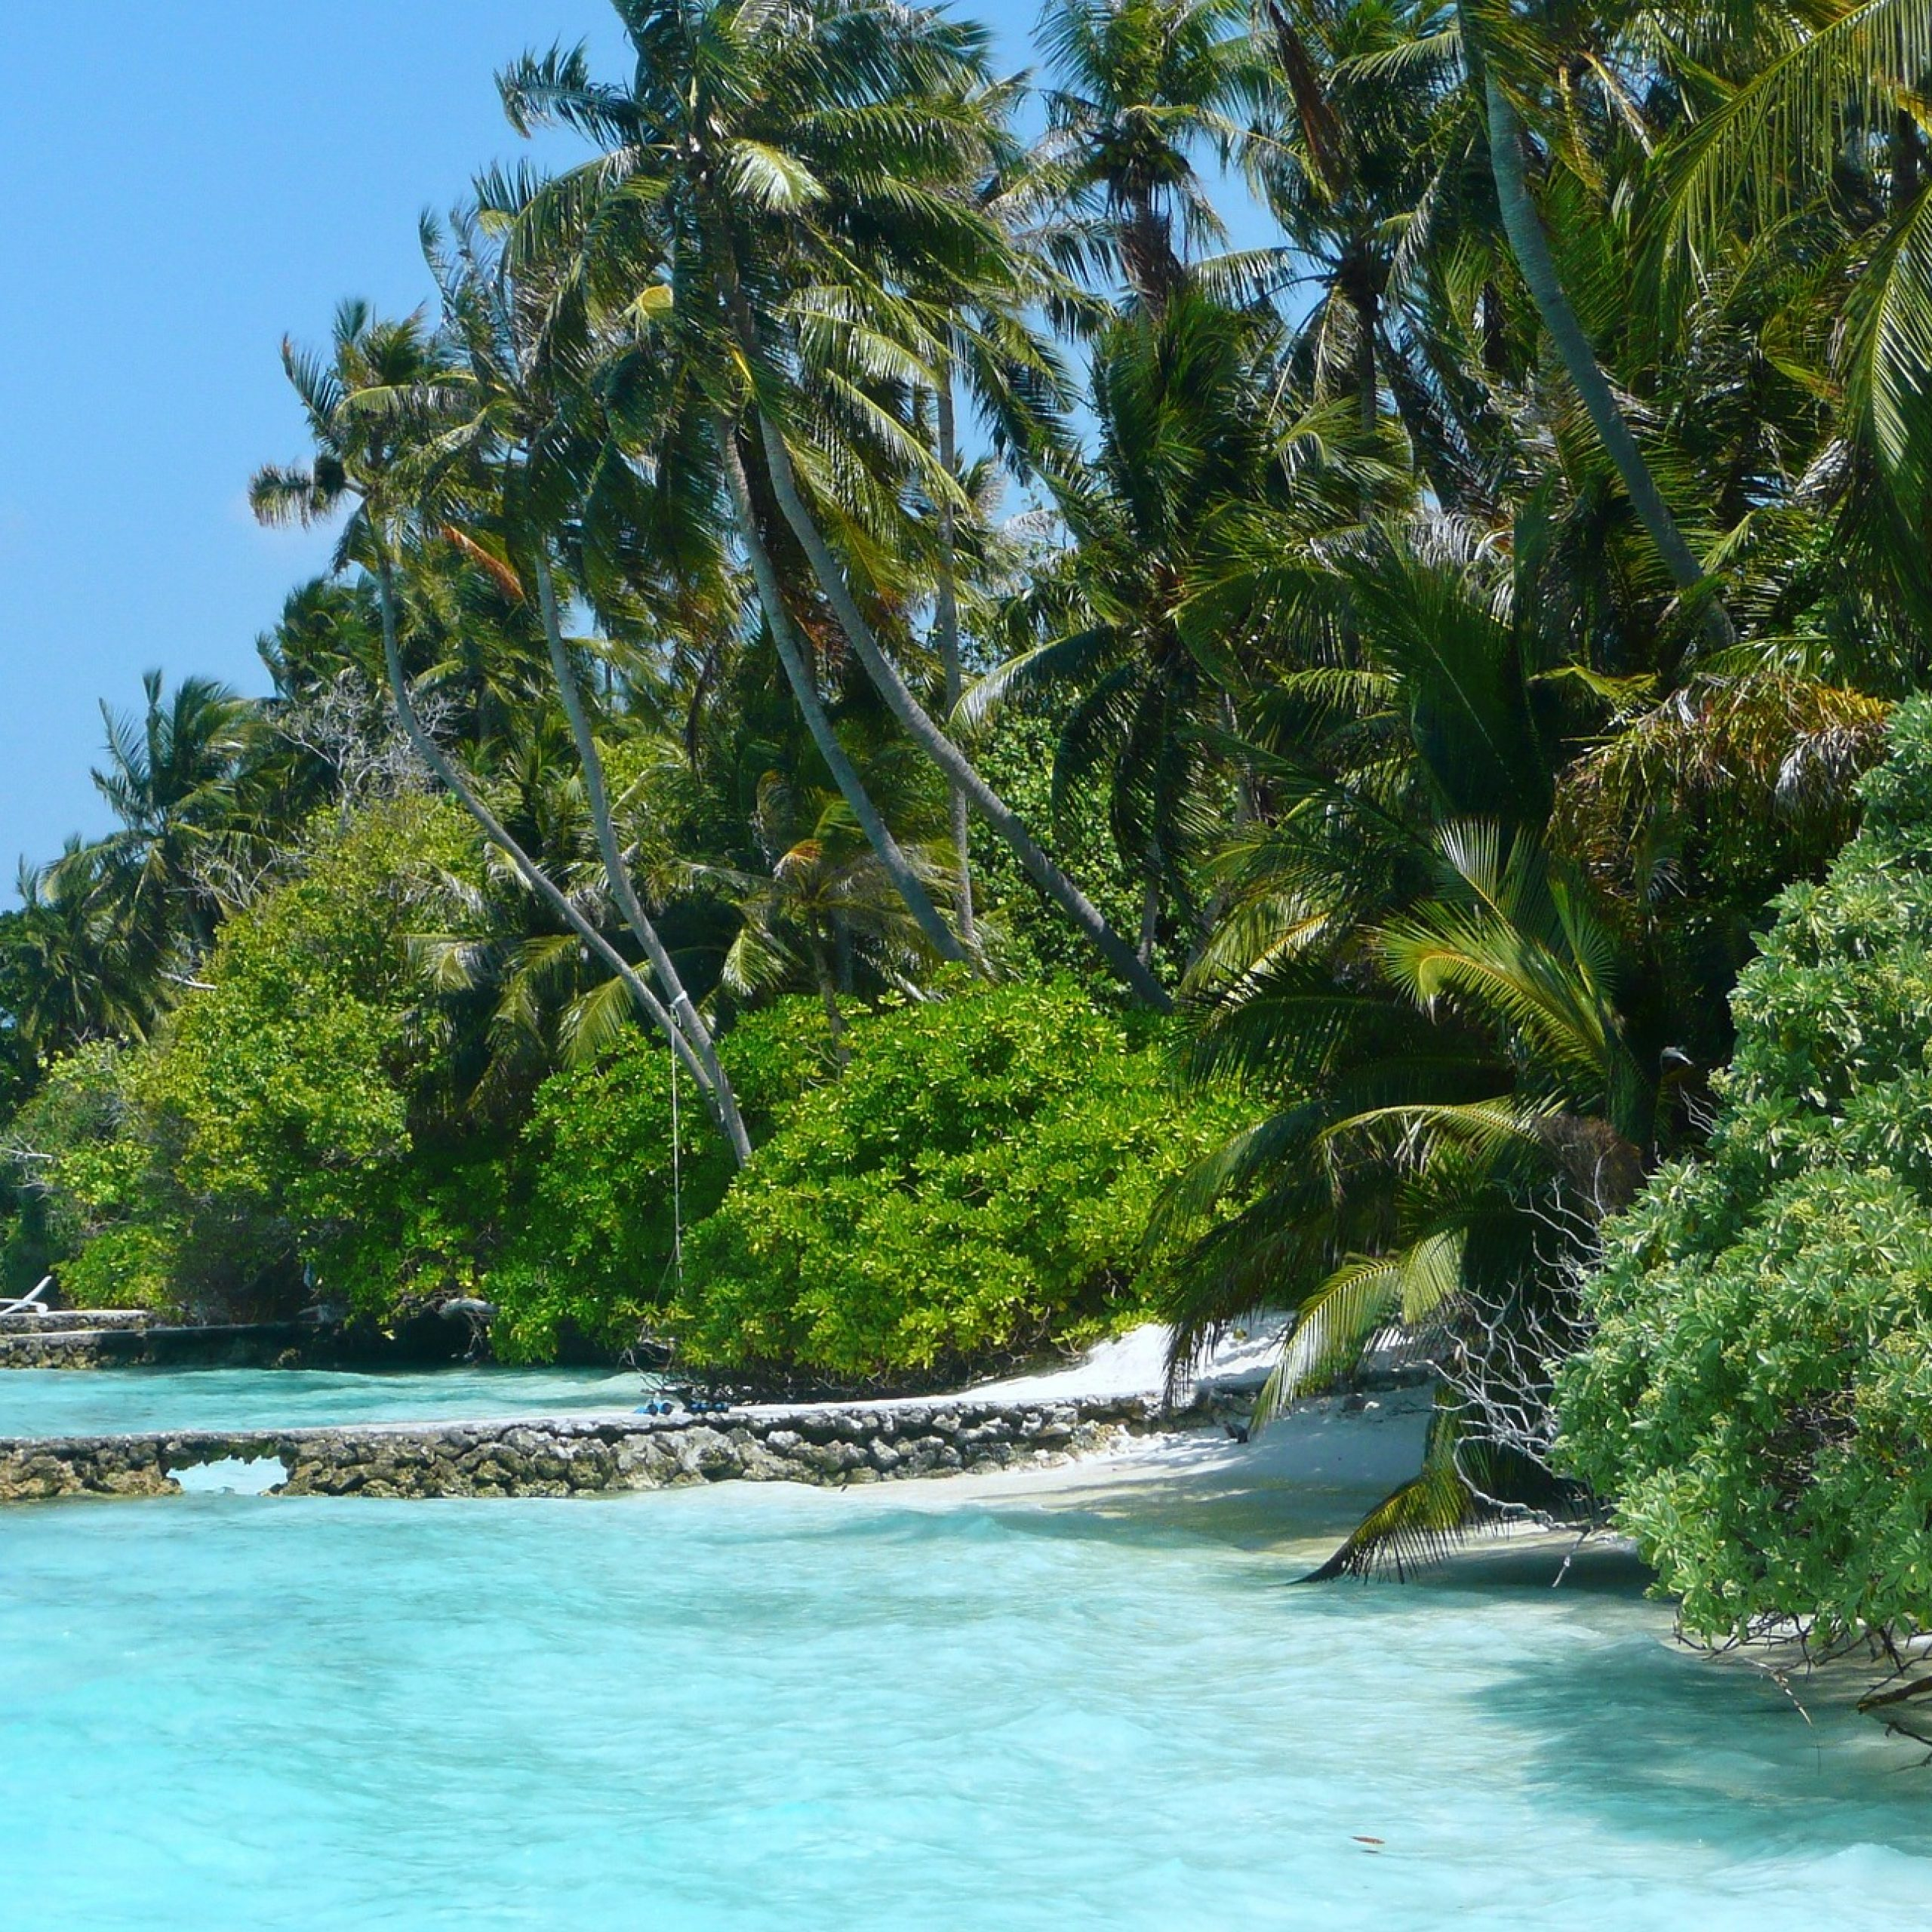 Evolution of Water Governance in Maldives